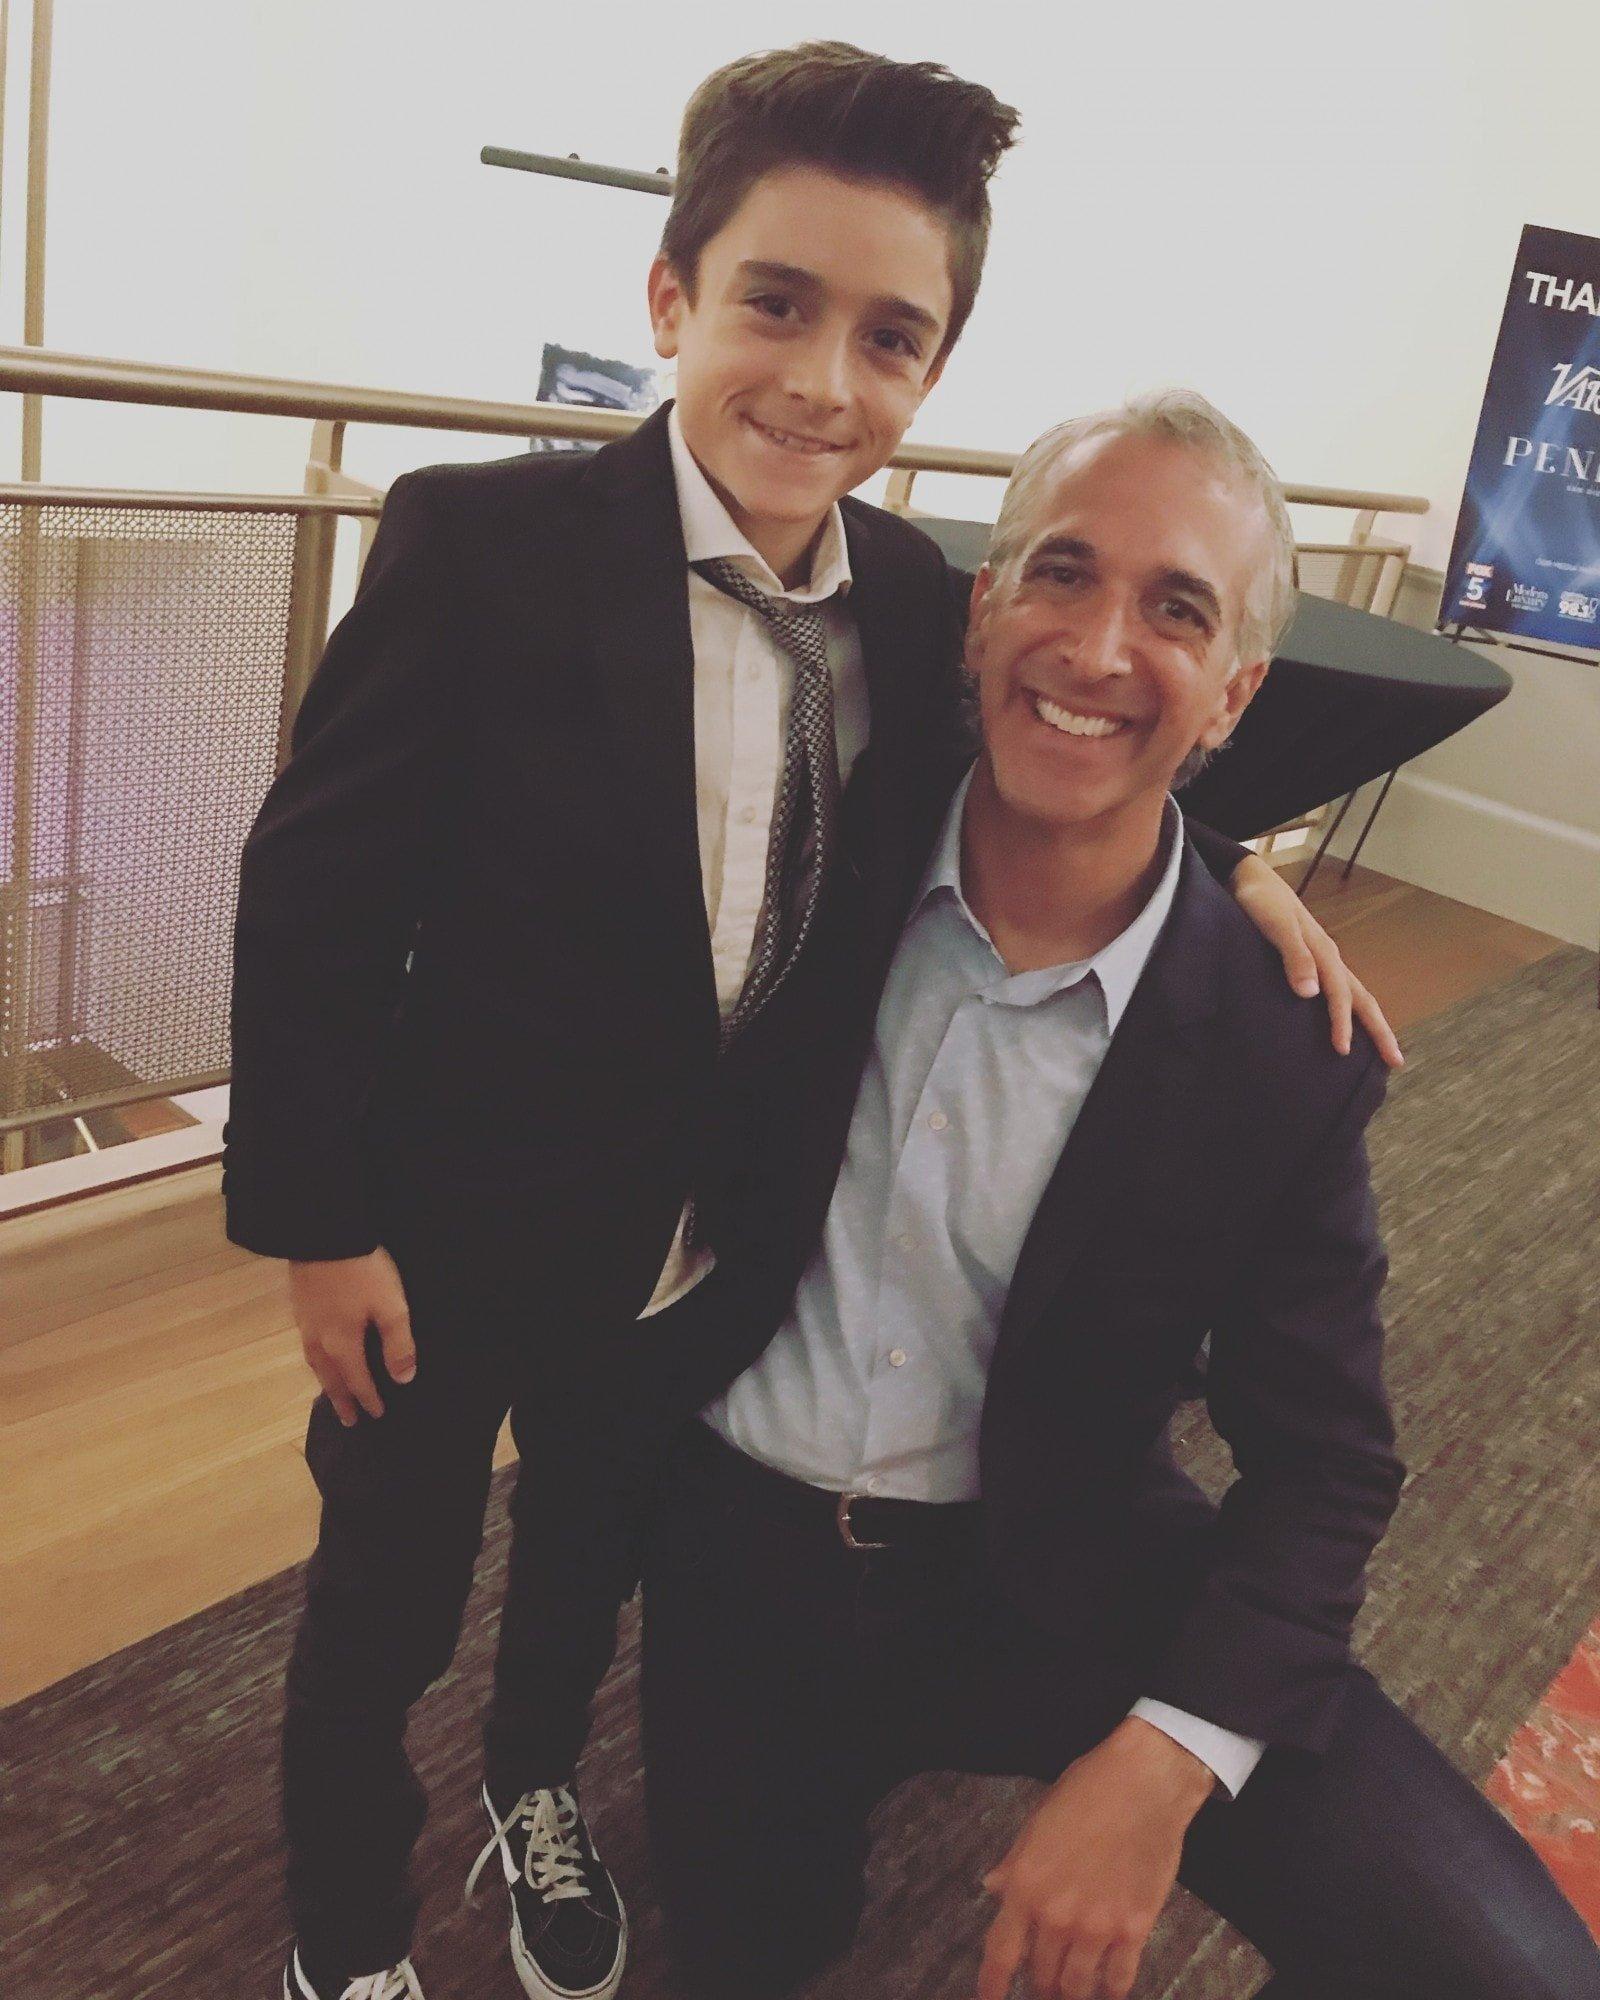 Jackson and filmmaker